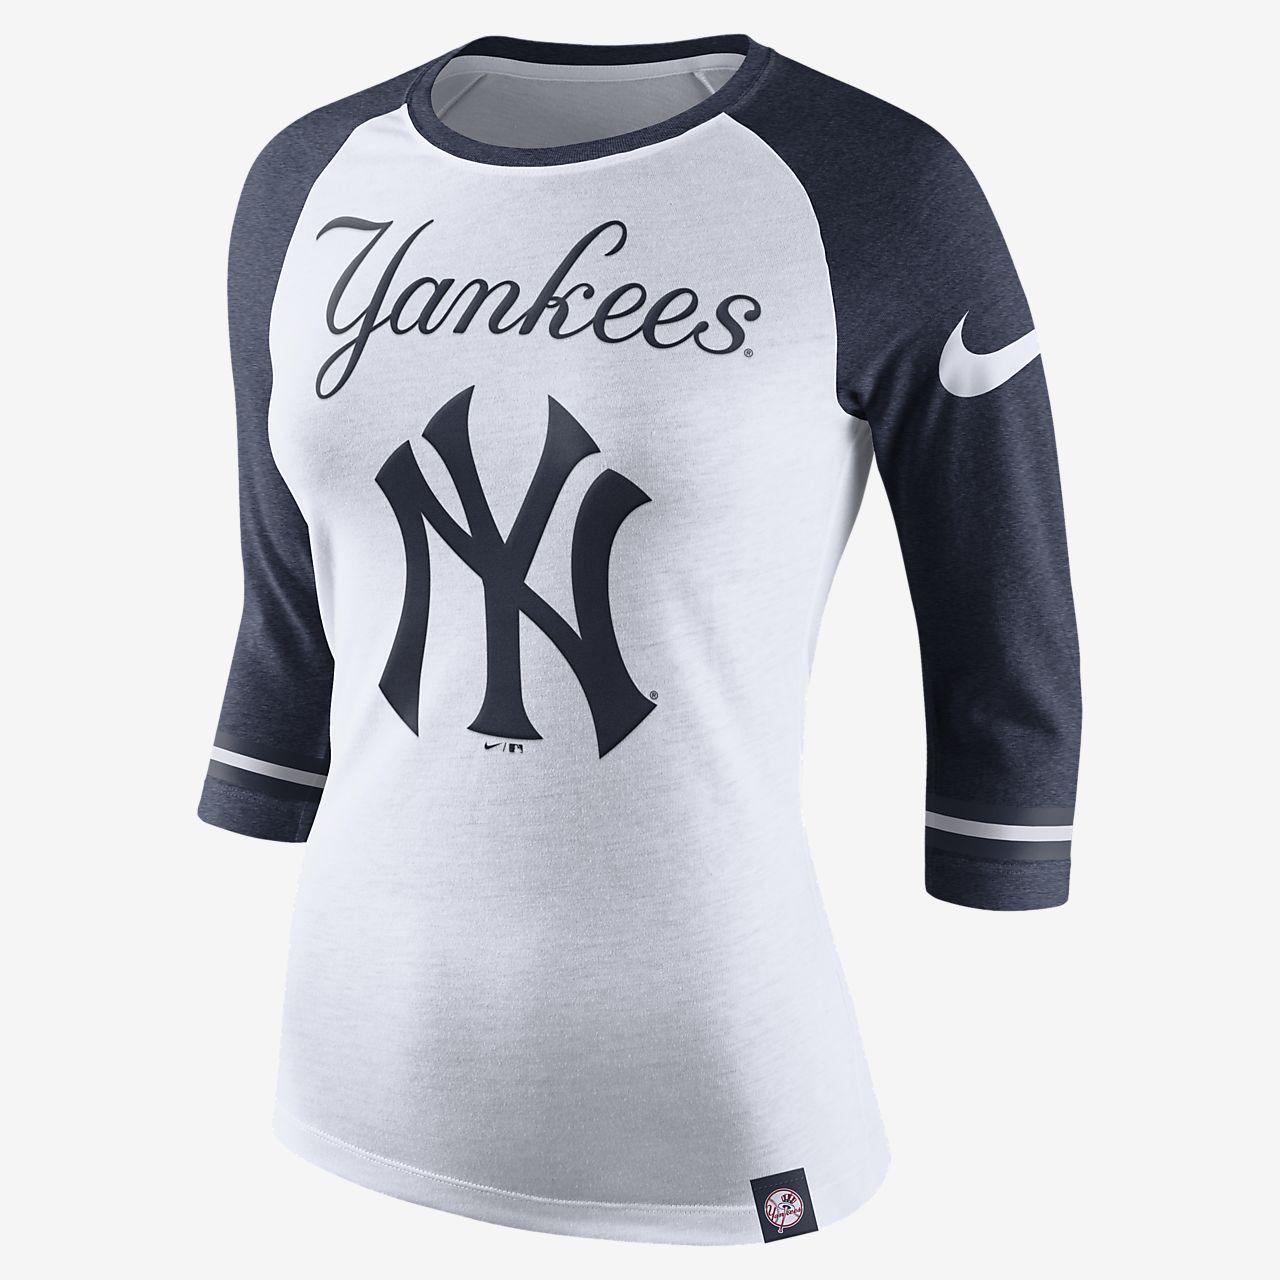 ... Nike Raglan (MLB Yankees) Women's 3/4 Sleeve T-Shirt